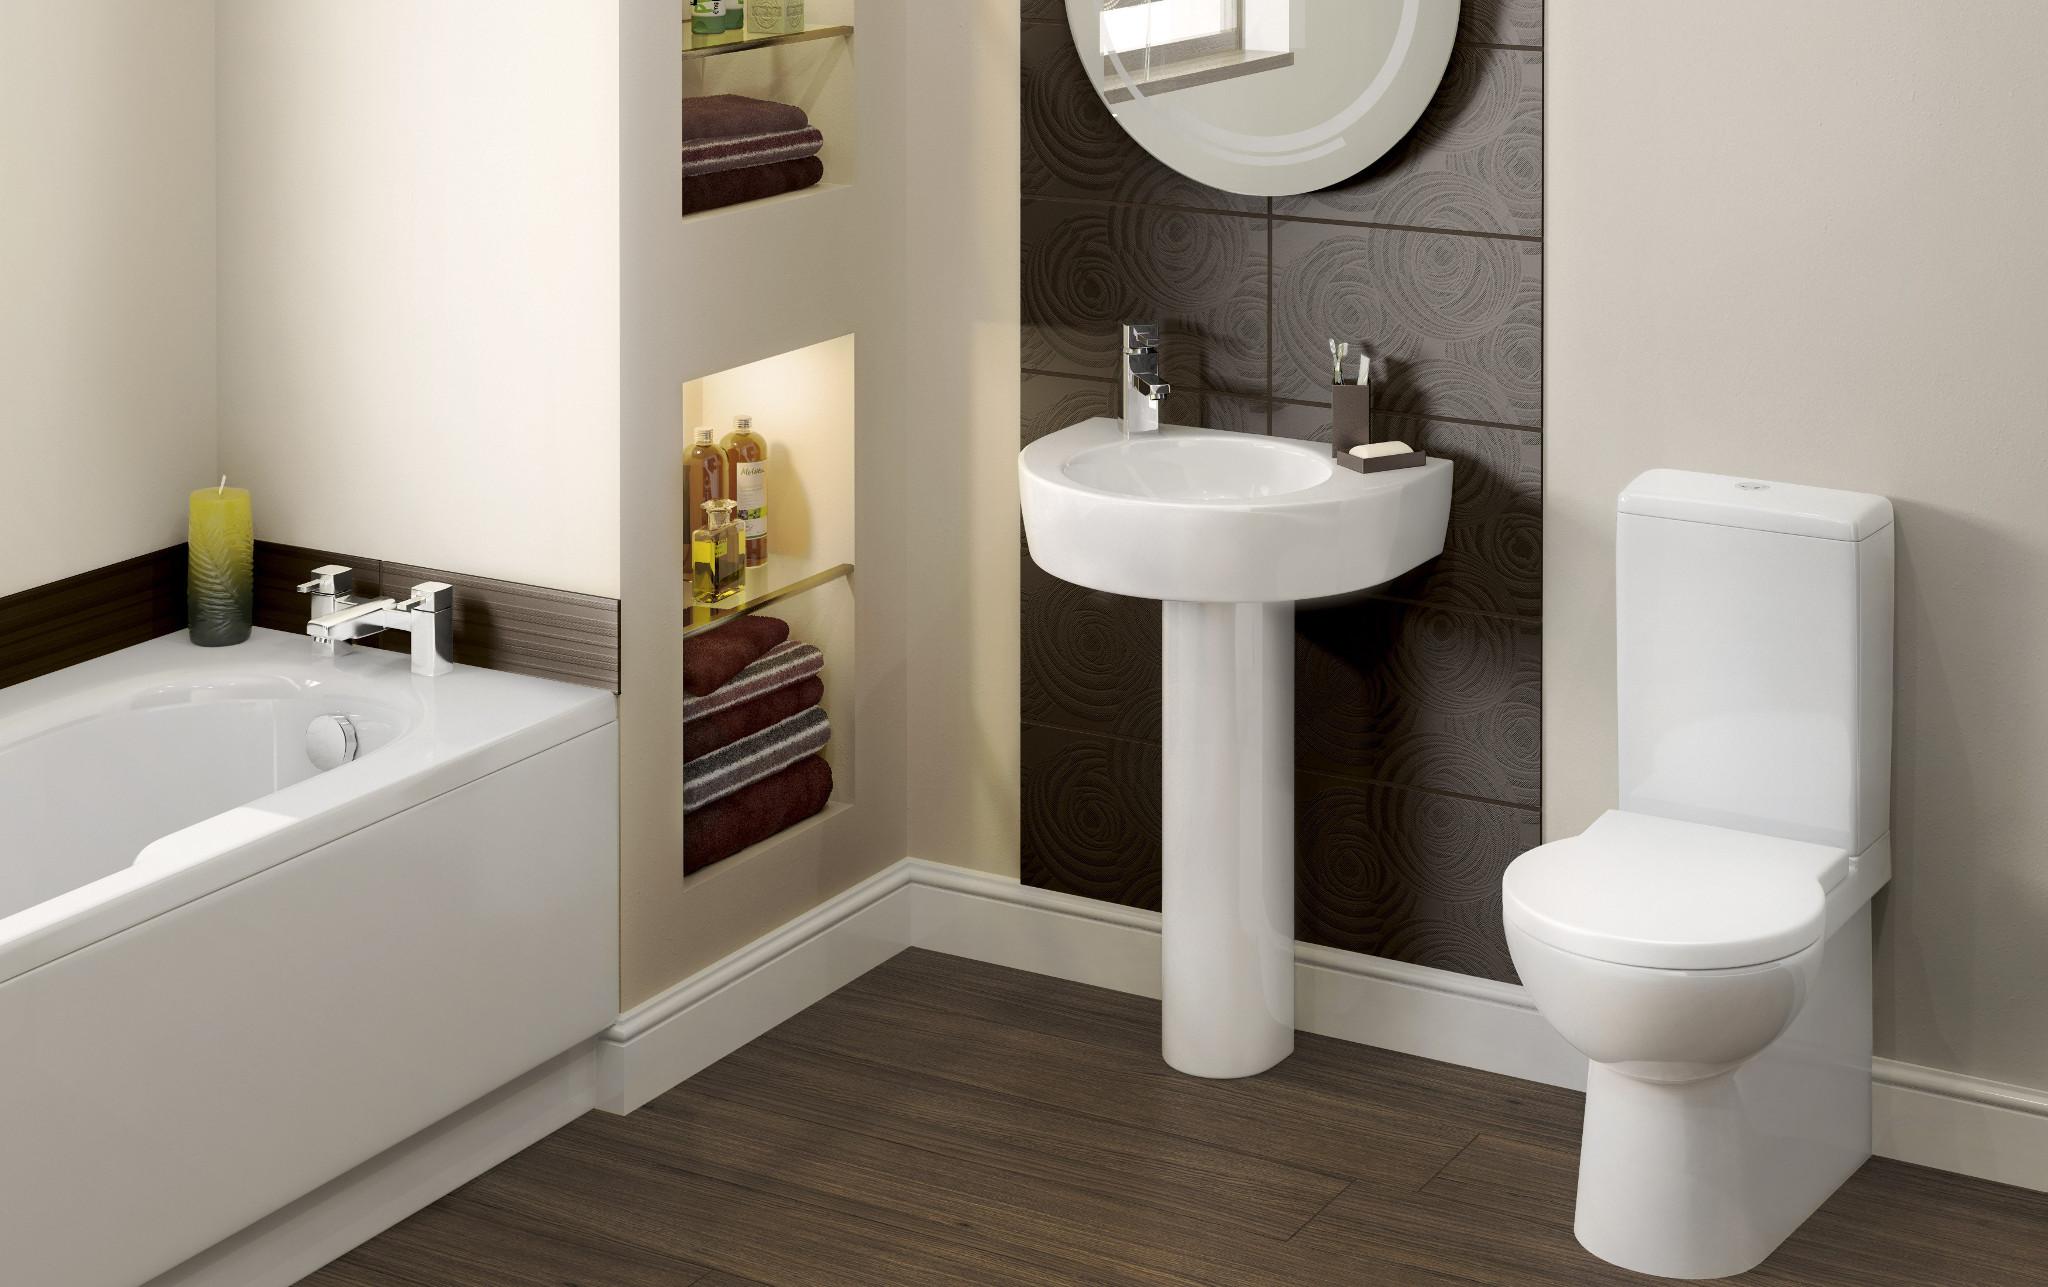 Bathroom & toilets